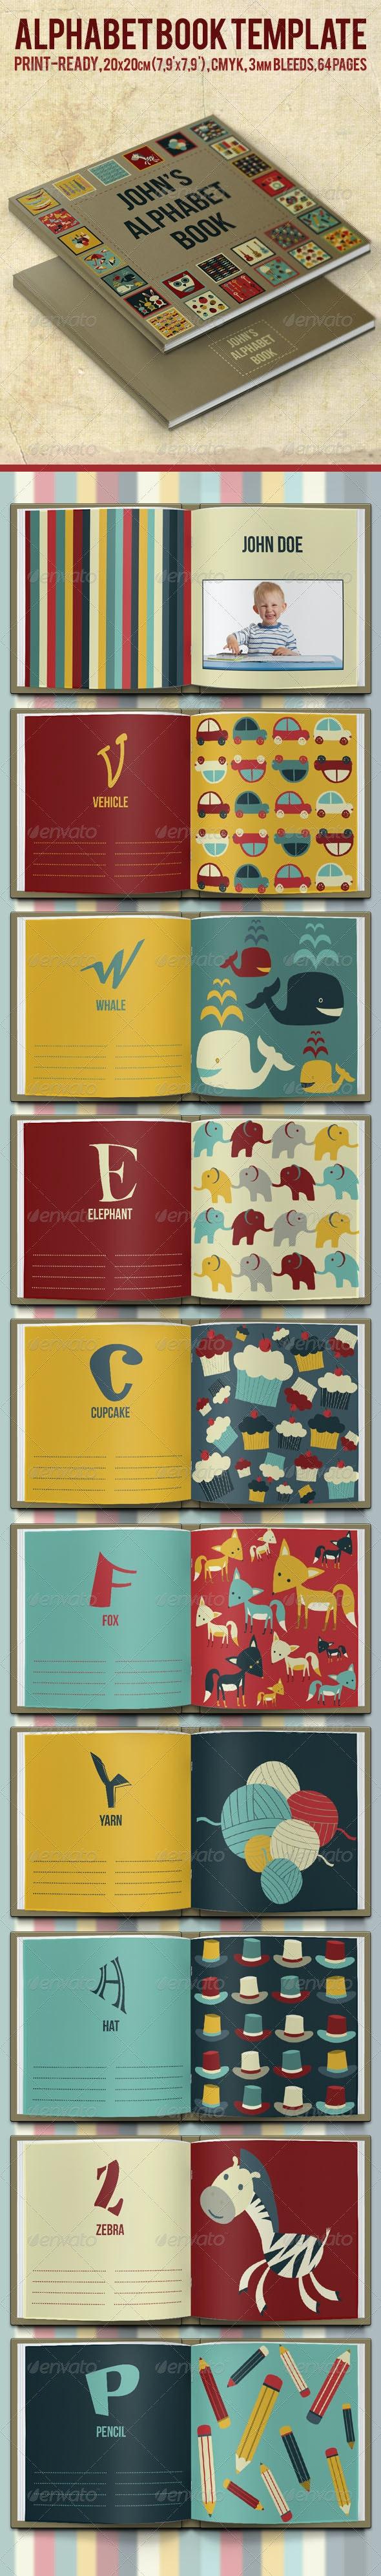 Alphabet Book Template - Miscellaneous Print Templates